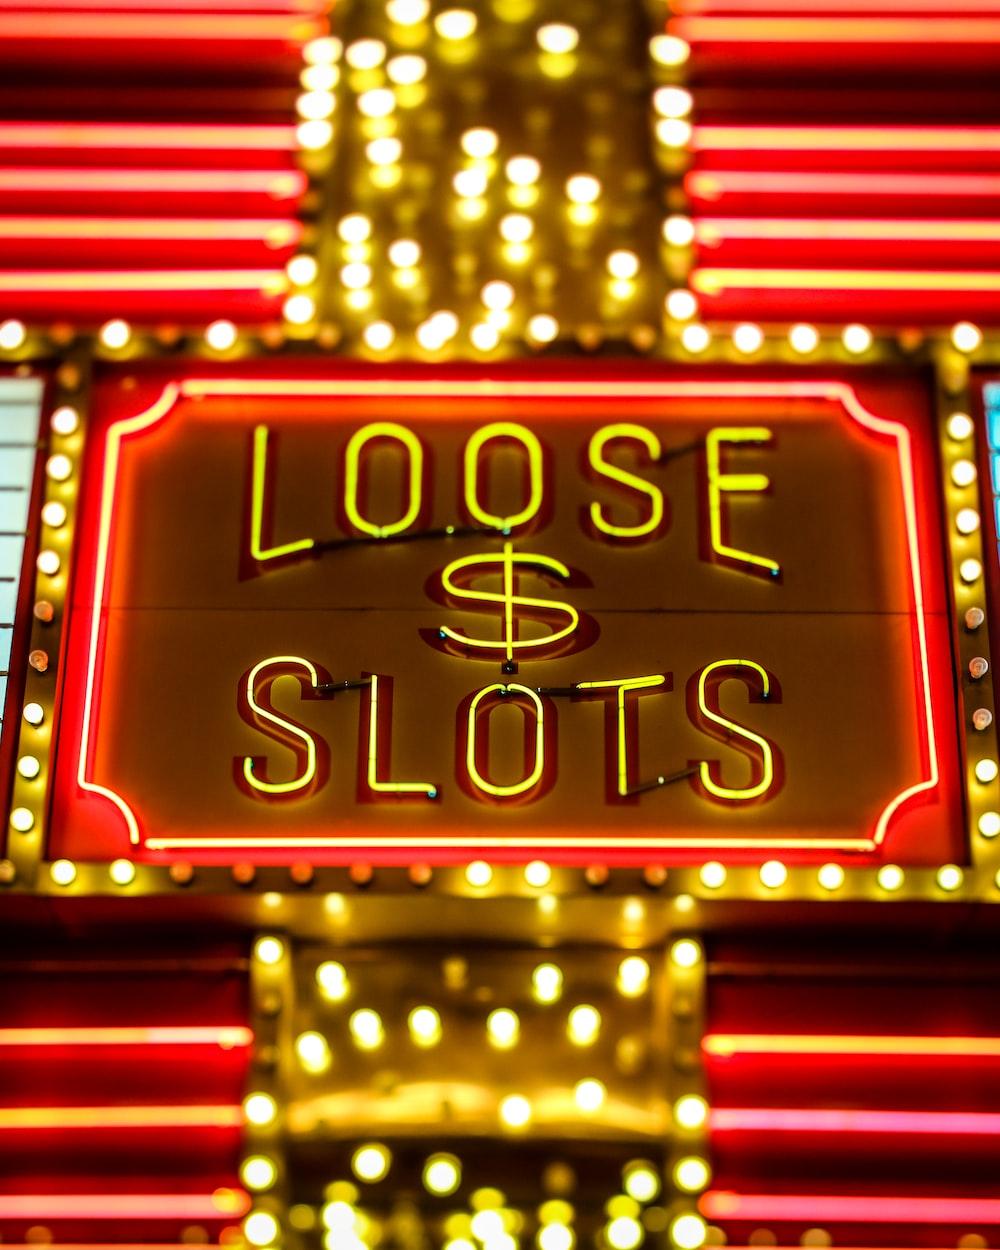 Loose slots neon signage